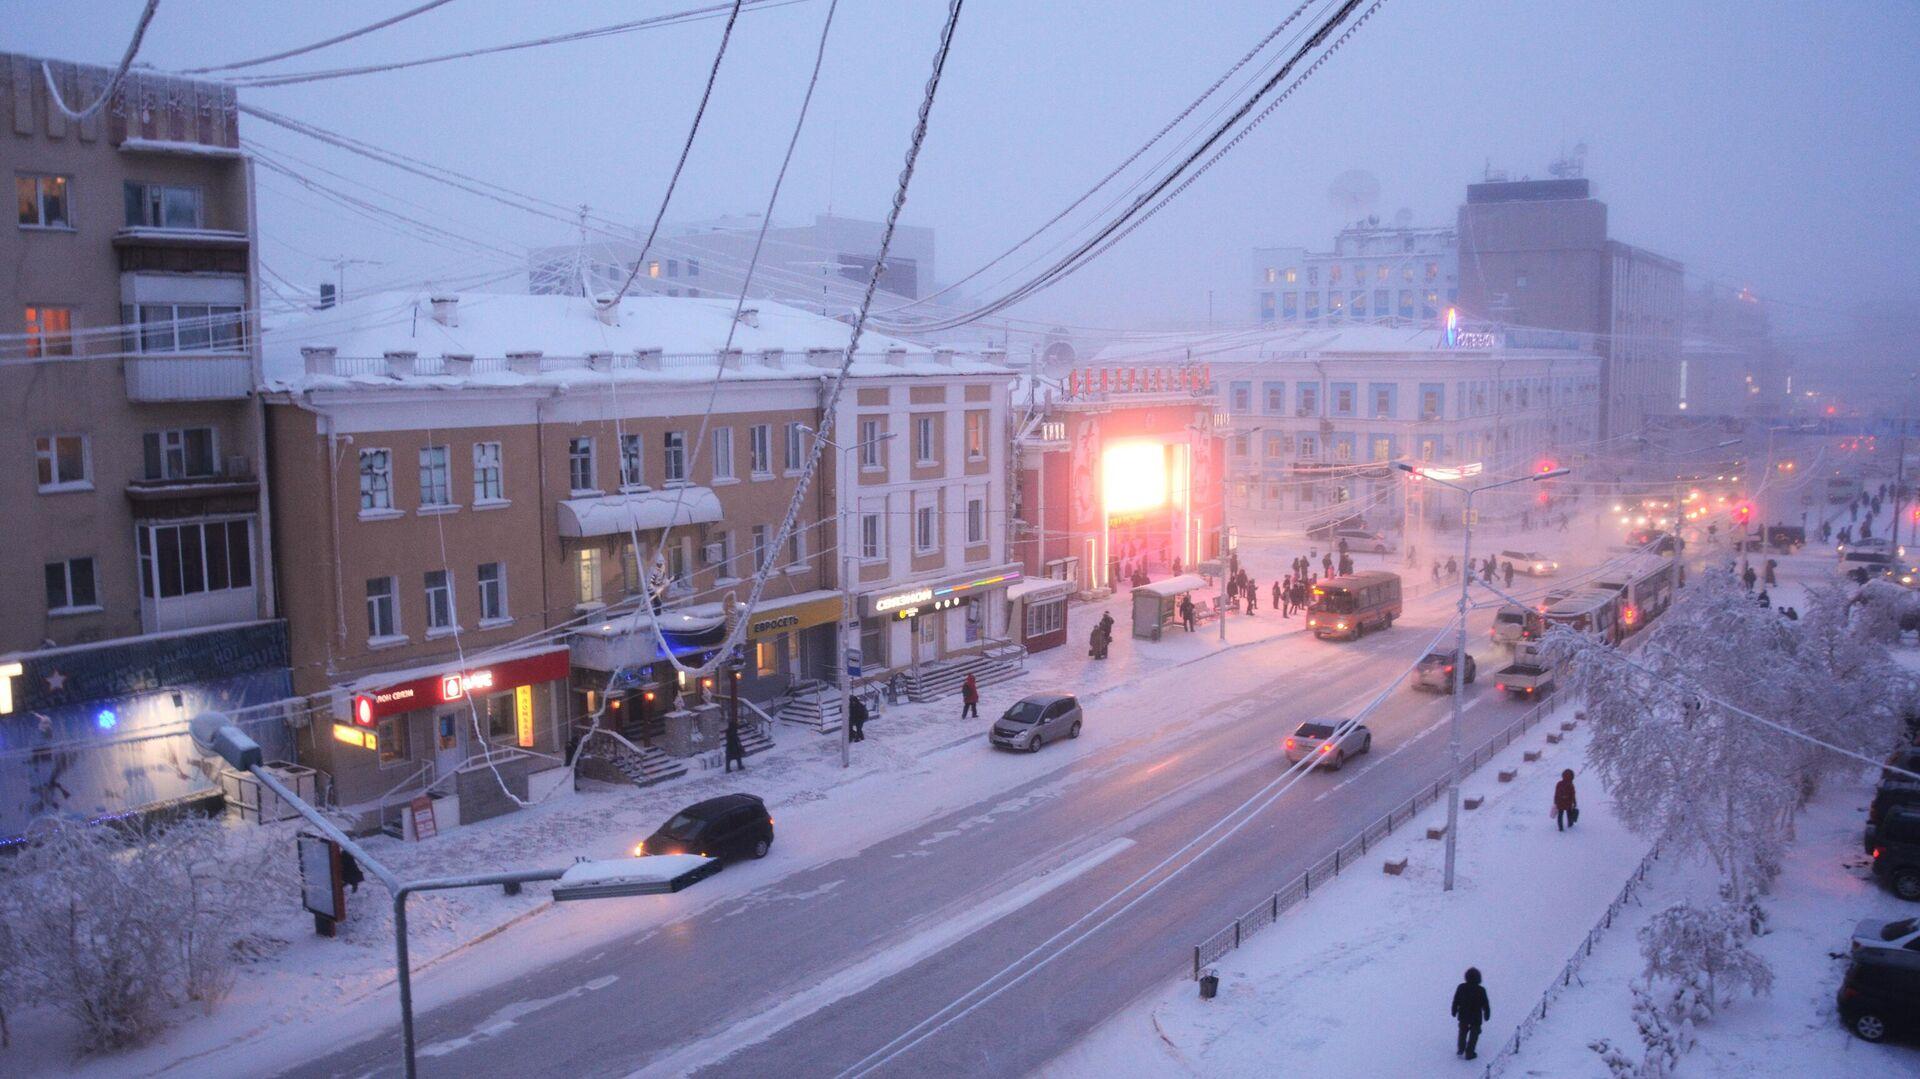 Проспект Ленина в городе Якутске - РИА Новости, 1920, 03.01.2021